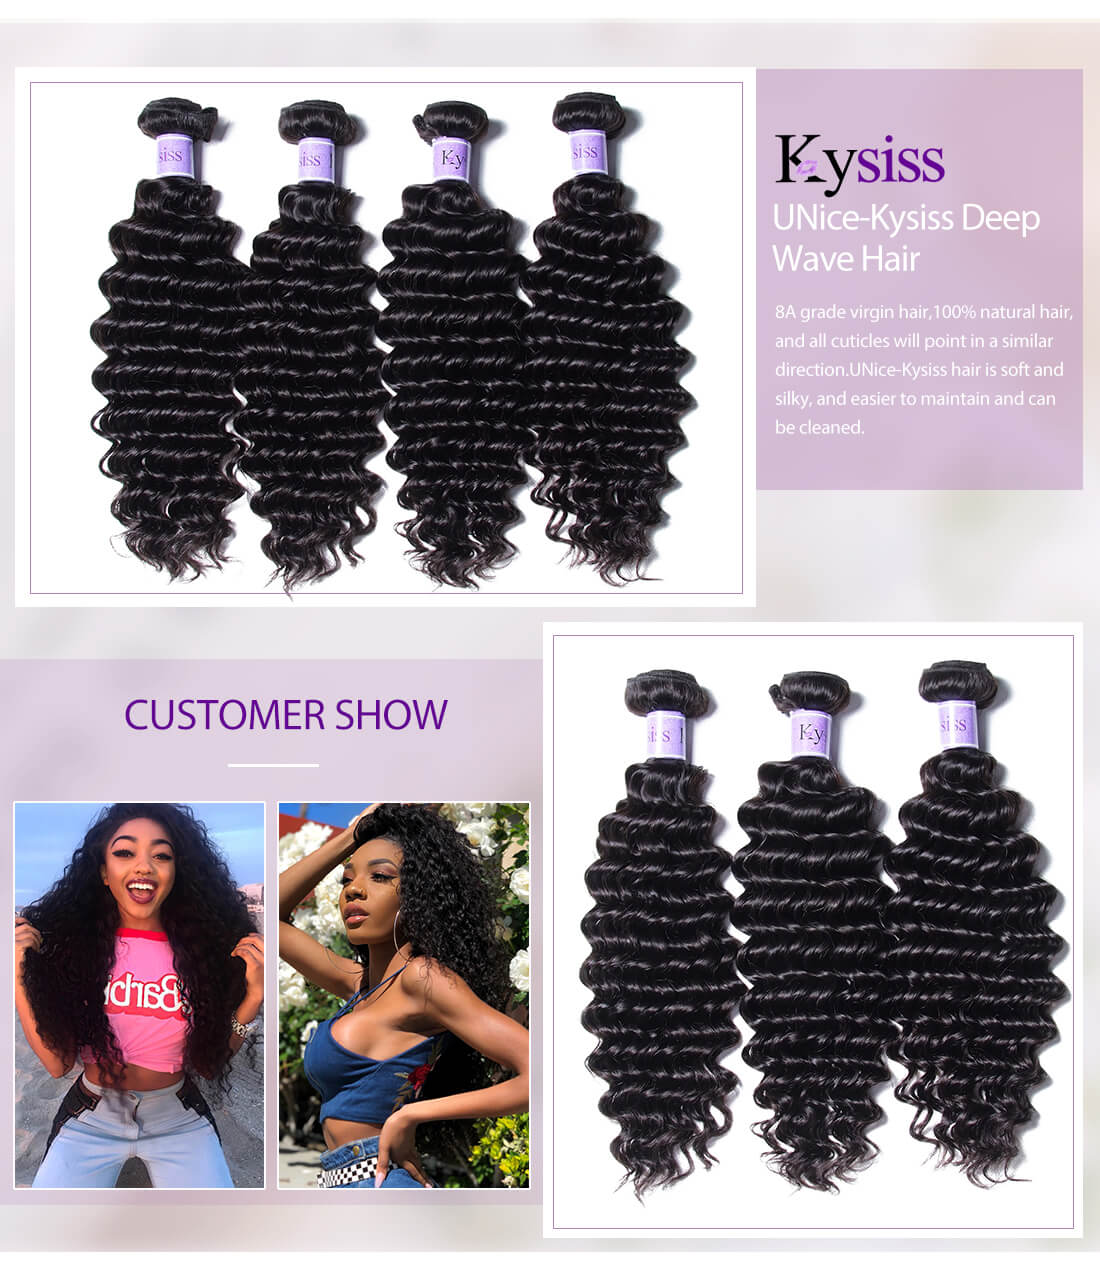 UNice Hair Kysiss Series Deep Wave Hair